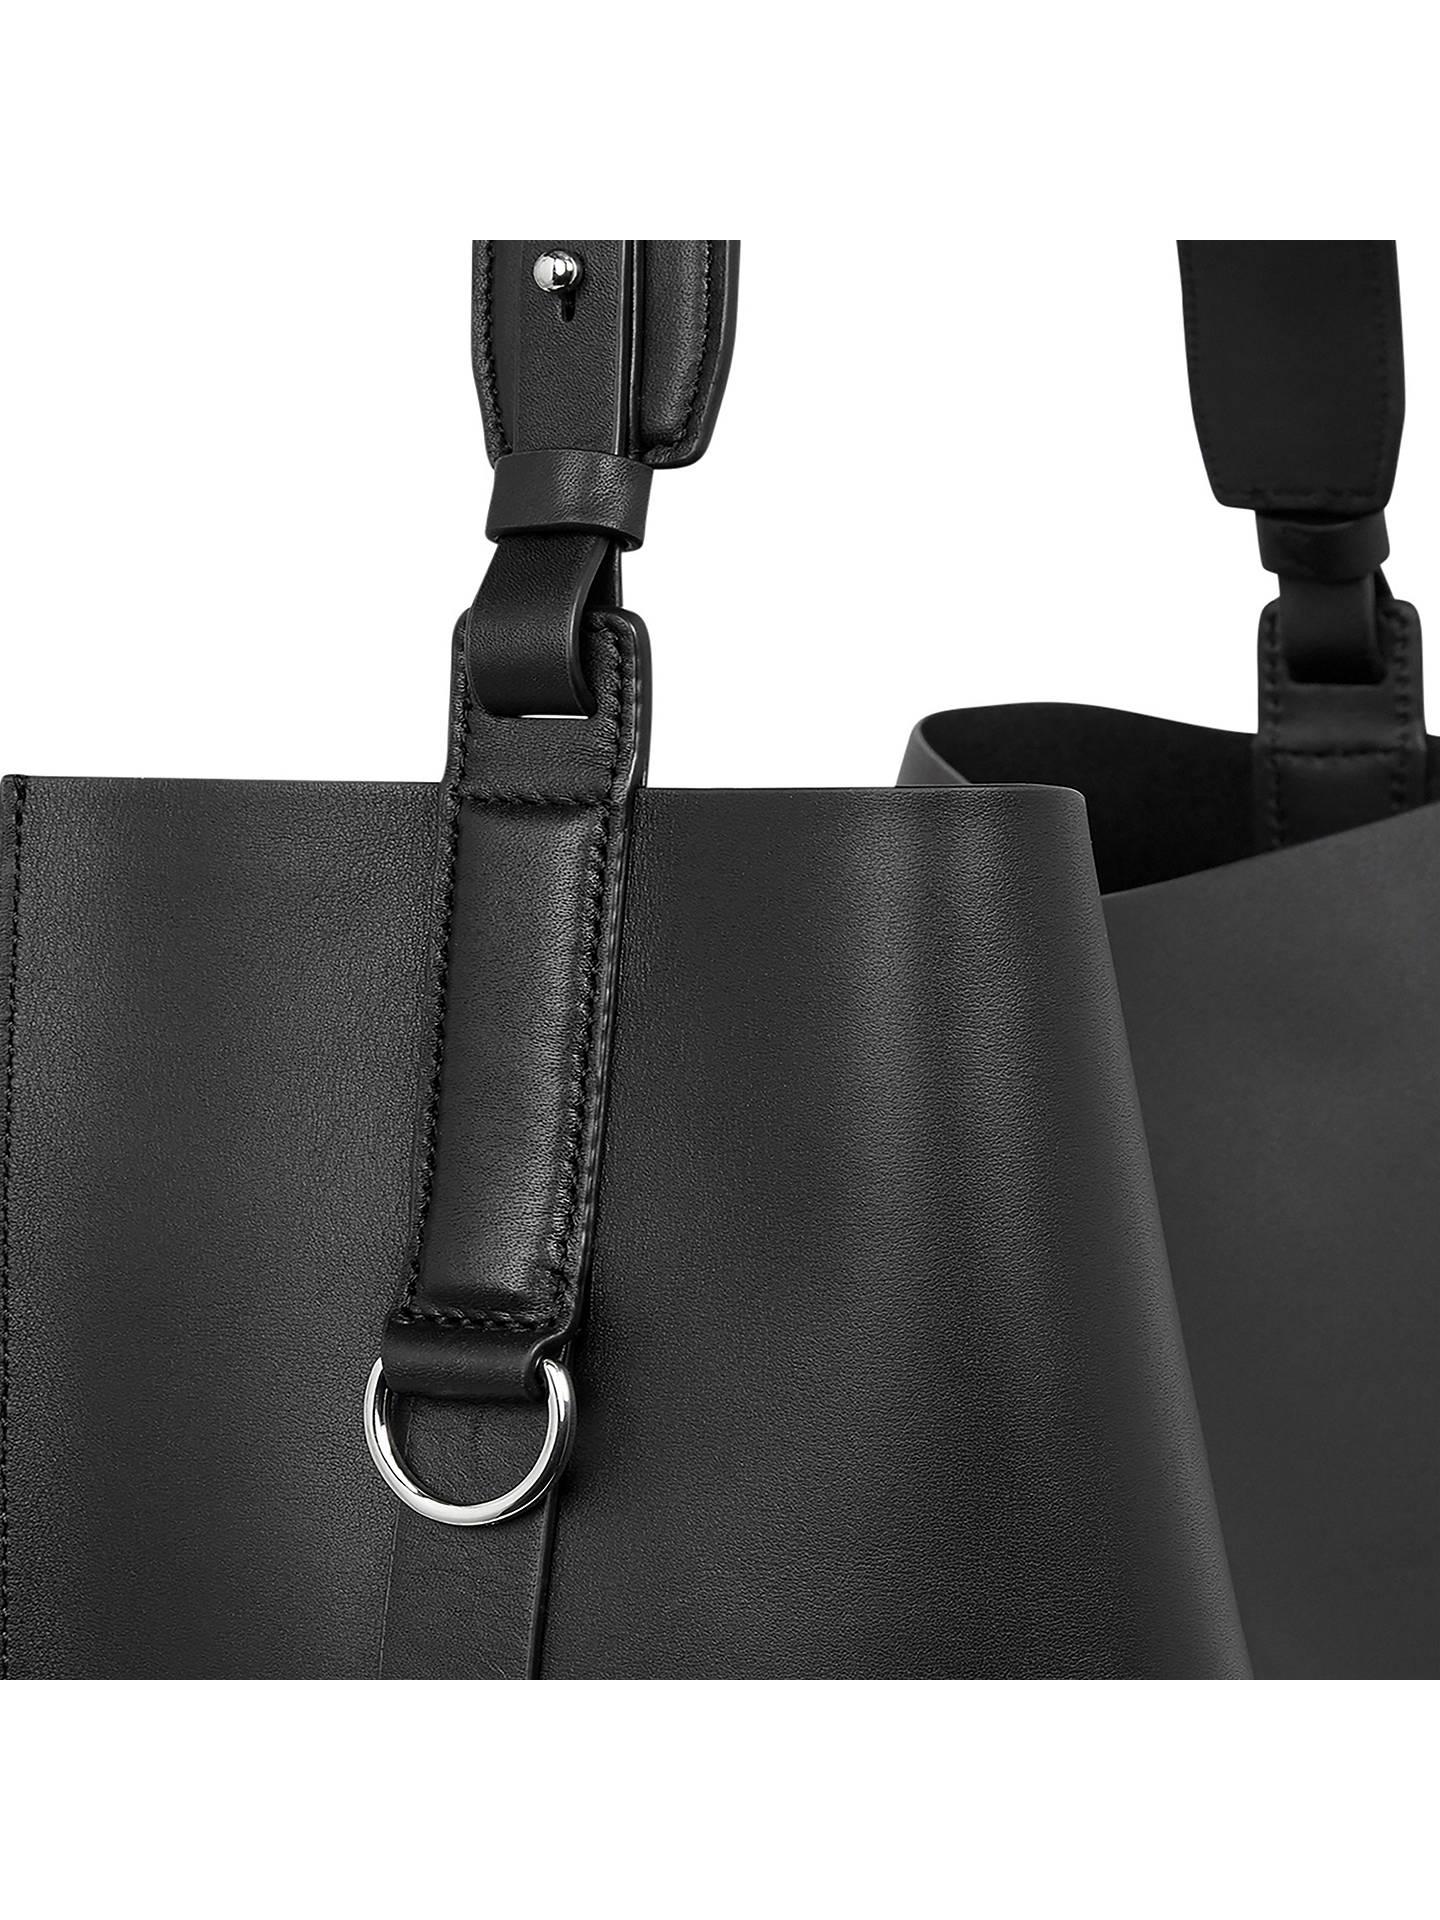 670183613 ... Buy AllSaints Suzi Leather North South Tote Bag, Black Online at  johnlewis.com ...